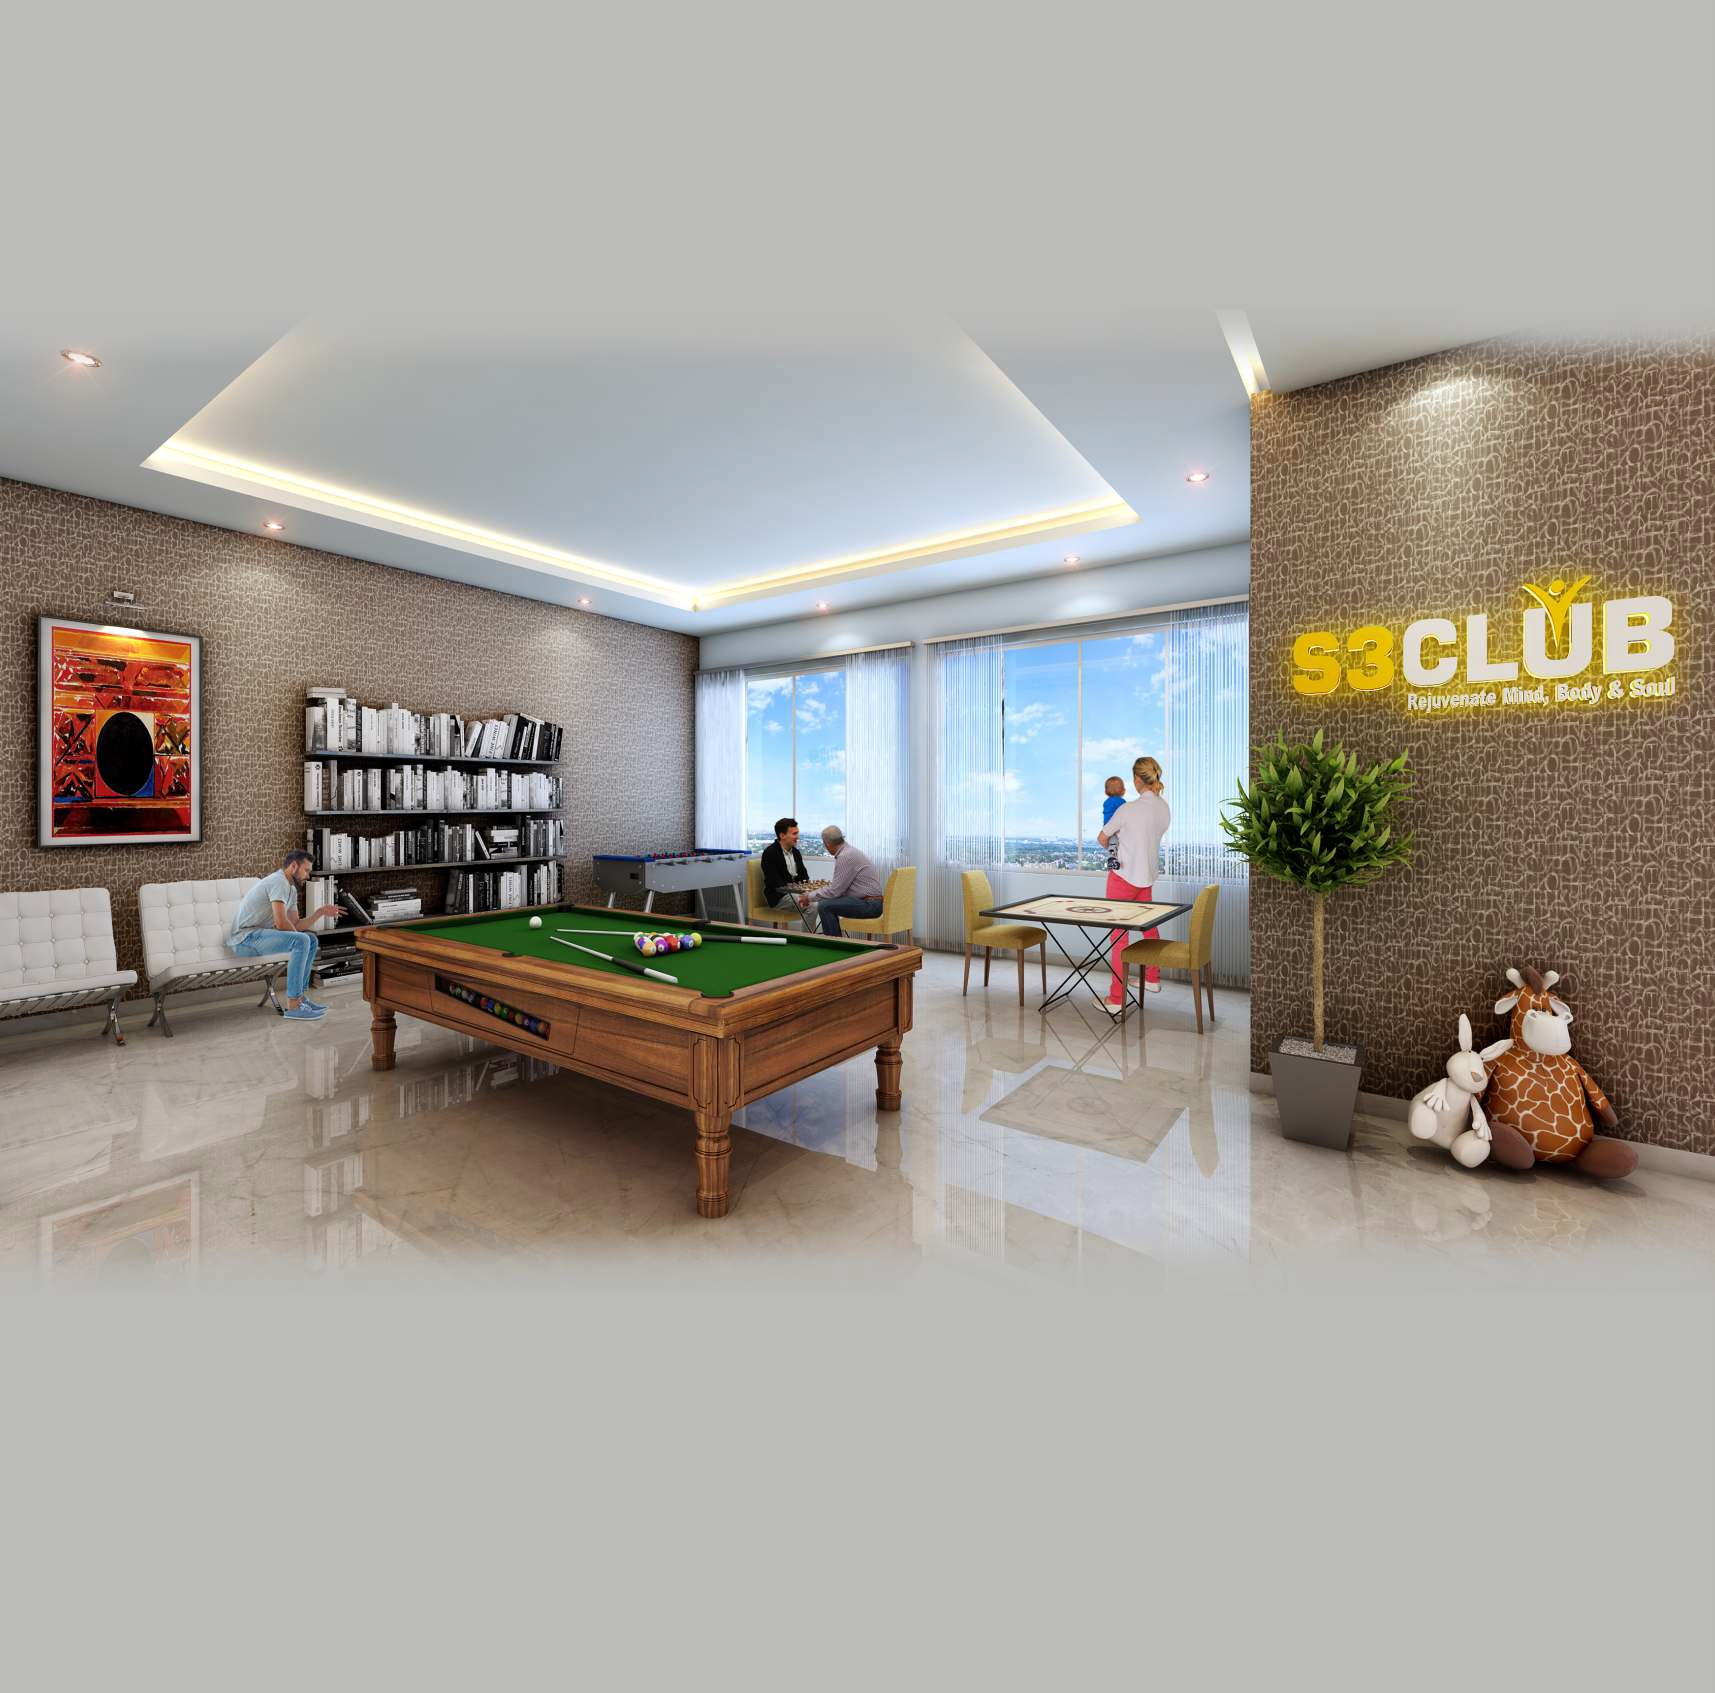 sanghvi s3 proxima amenities features2